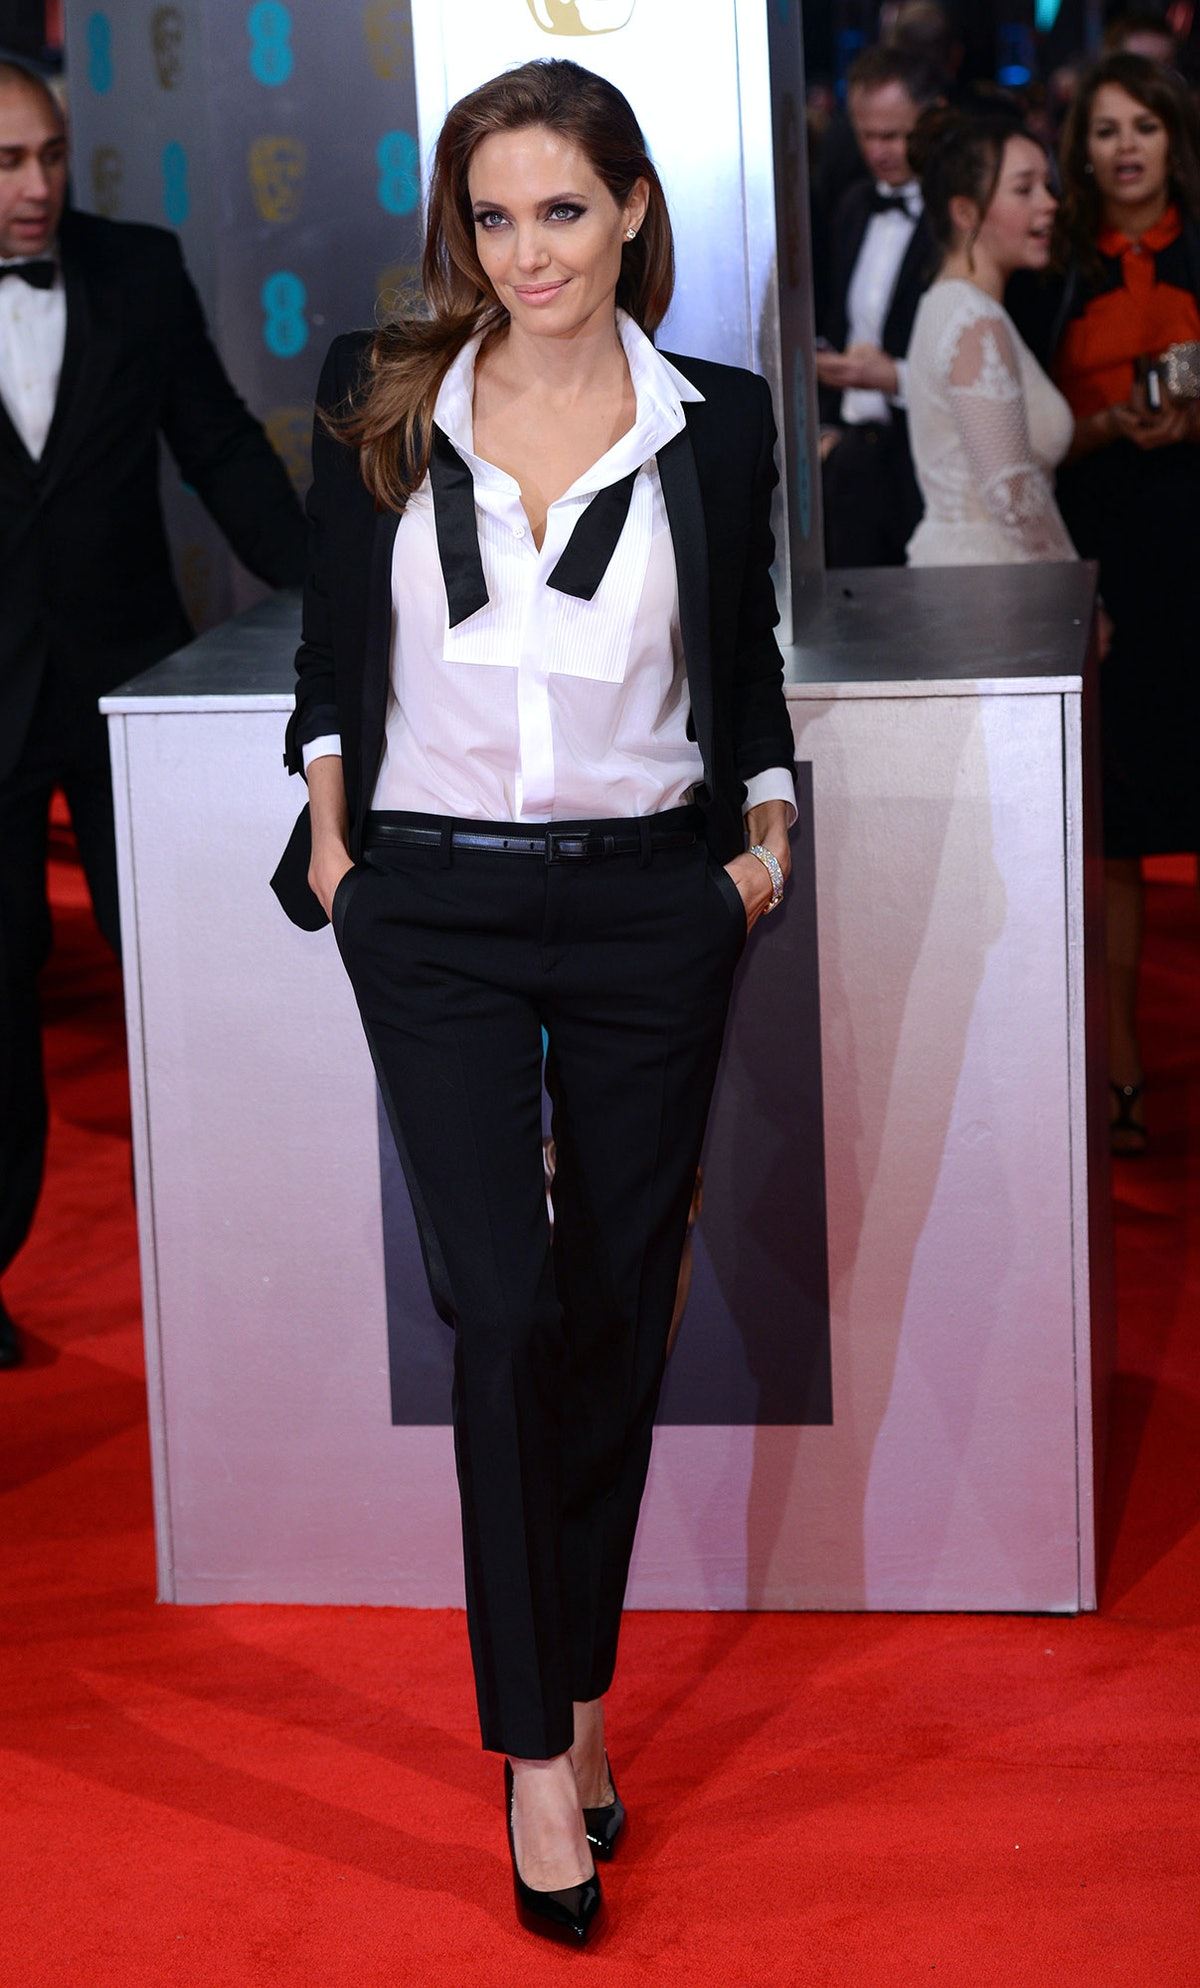 Angelina Jolie in a tuxedo